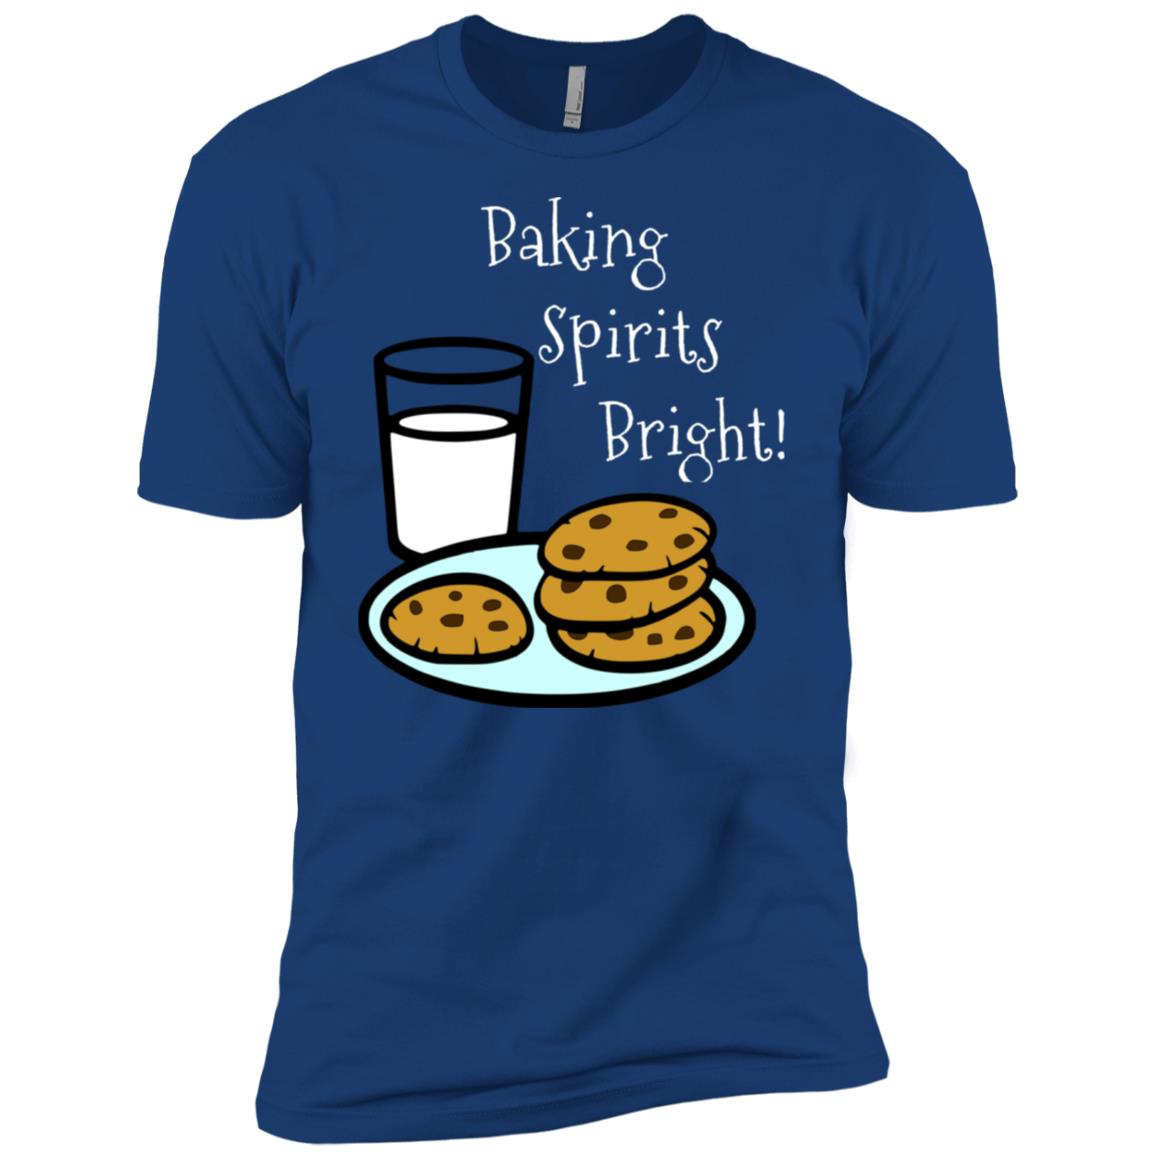 Baking Spirits Bright! Cookies and Milk Men Short Sleeve T-Shirt